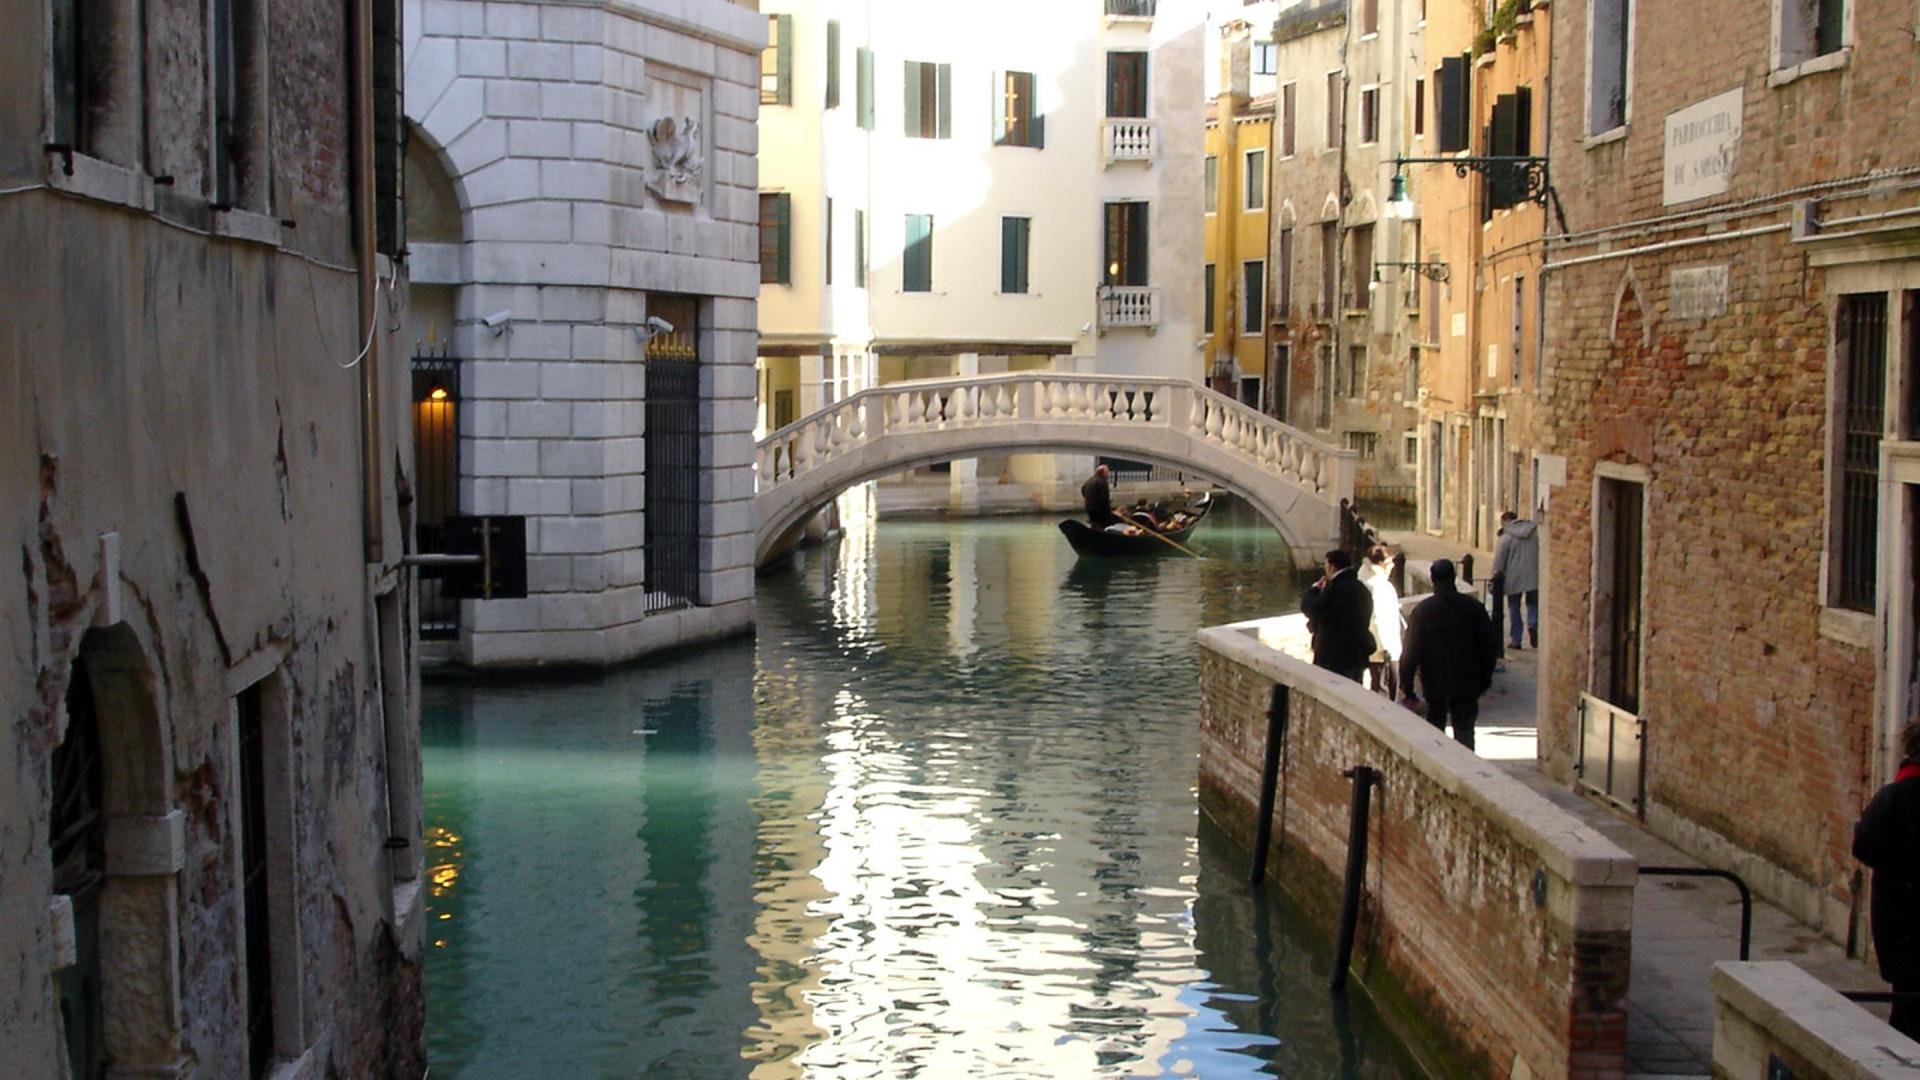 Cute Danbo Wallpaper Venice Bridge Italy City Photography Wallpaper Preview